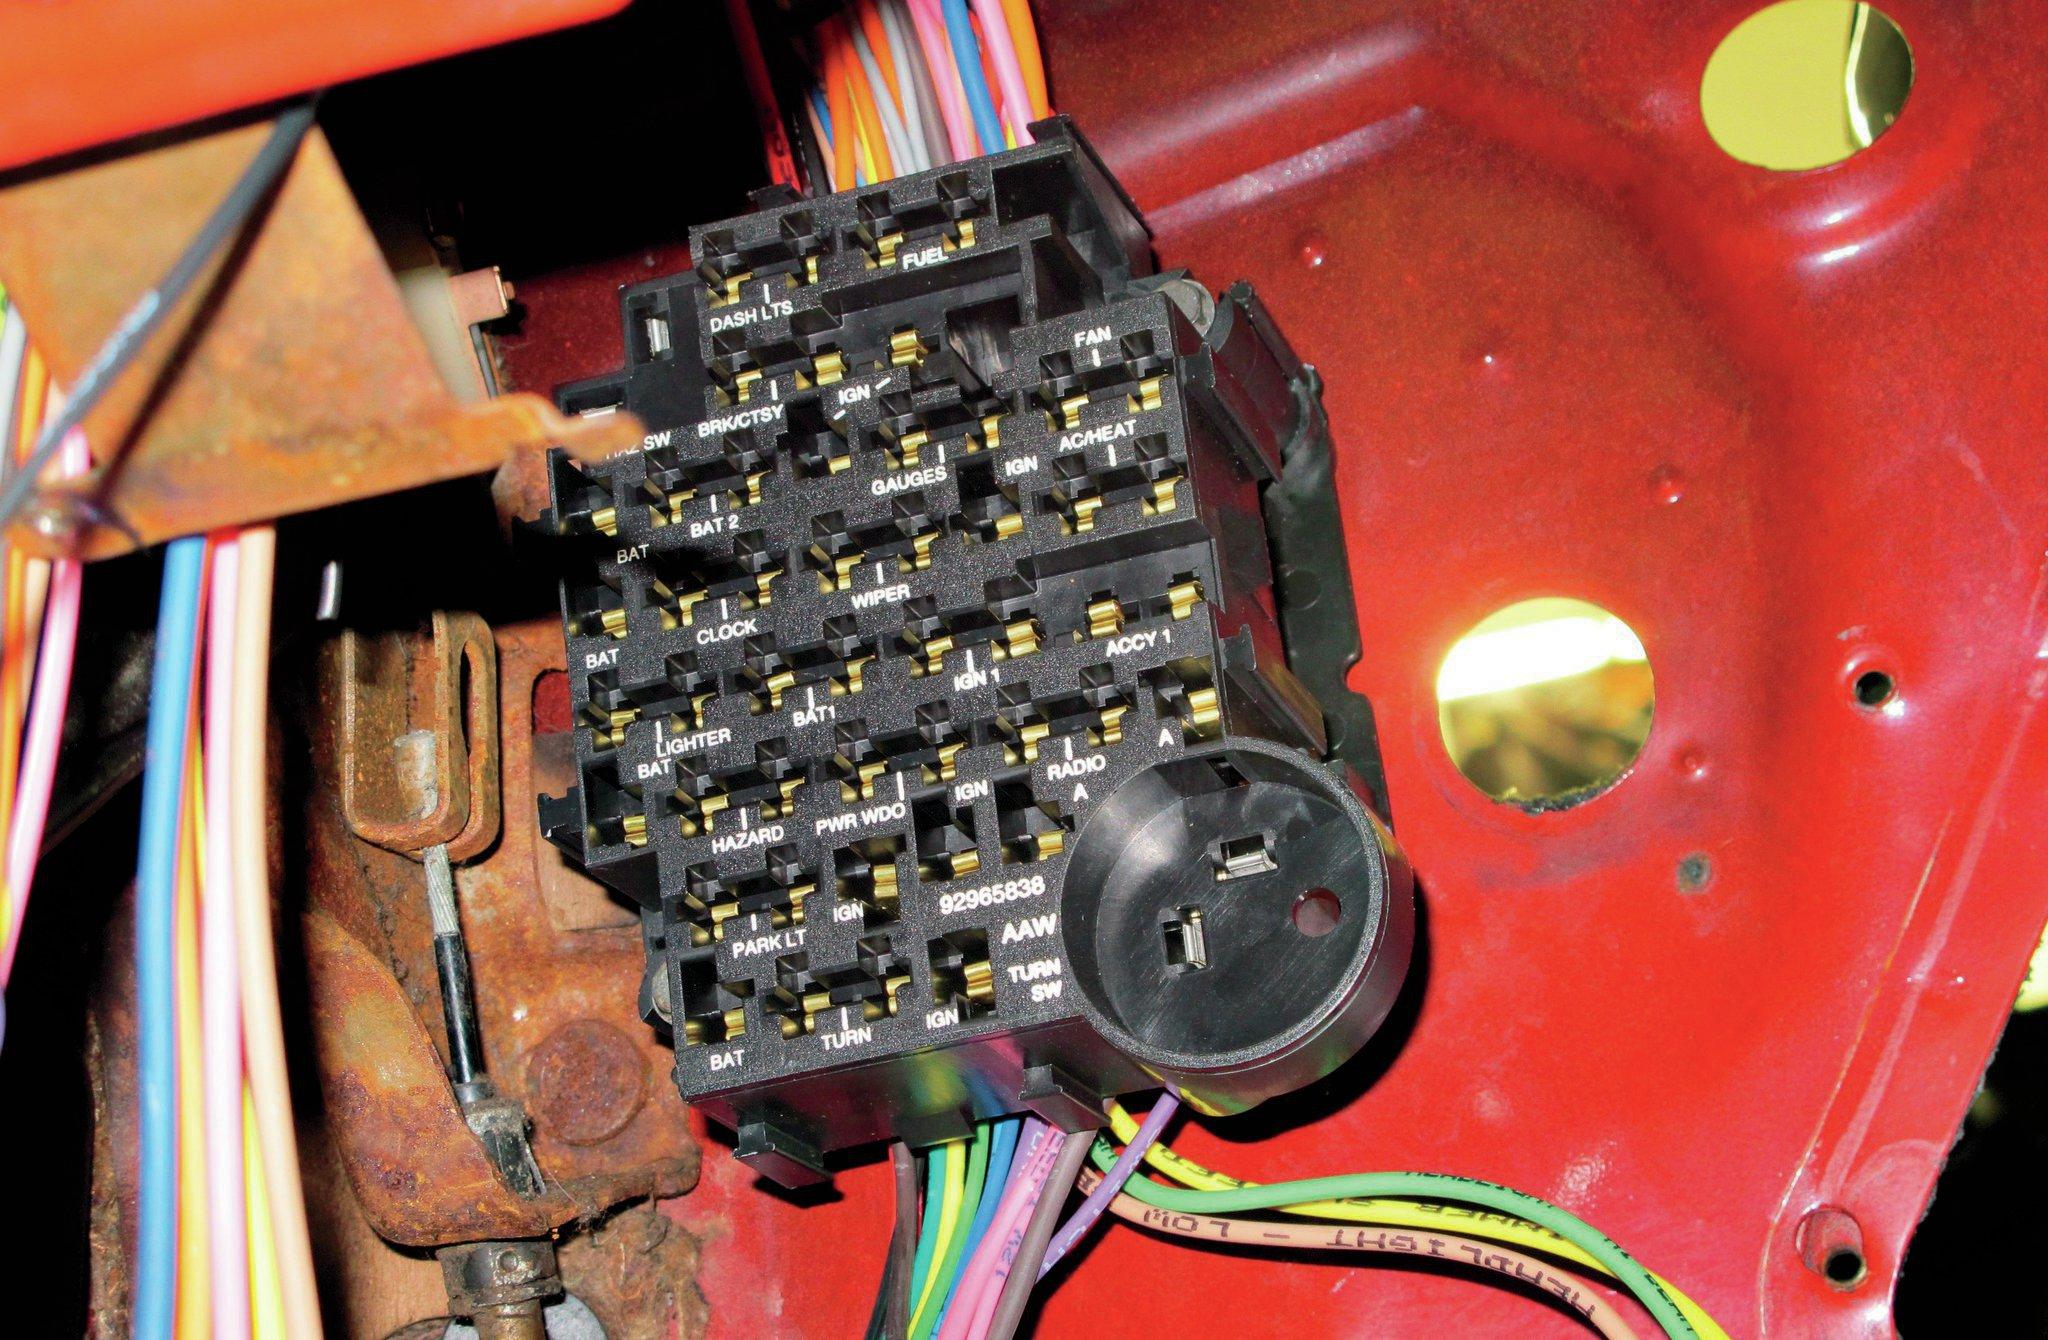 hight resolution of 70 gmc truck fuse box wiring diagram technic1970 c10 fuse box wiring diagram technic70 gmc truck